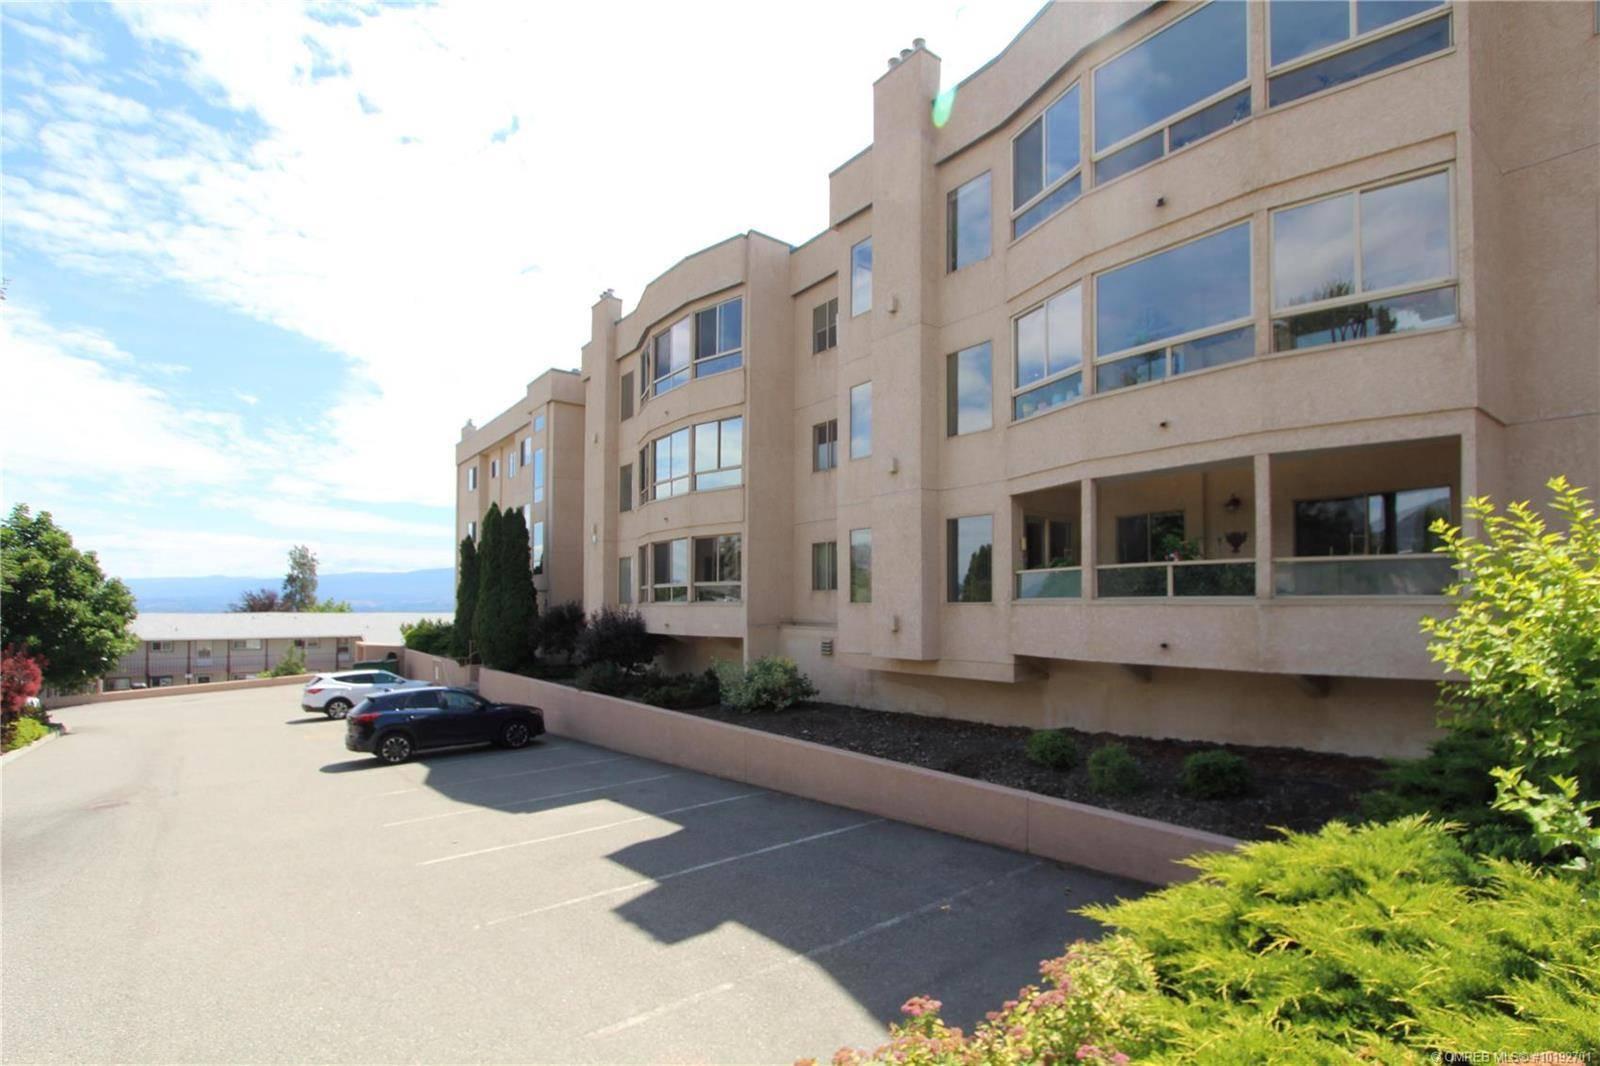 Condo for sale at 3767 Brown Rd Unit 204 West Kelowna British Columbia - MLS: 10192701